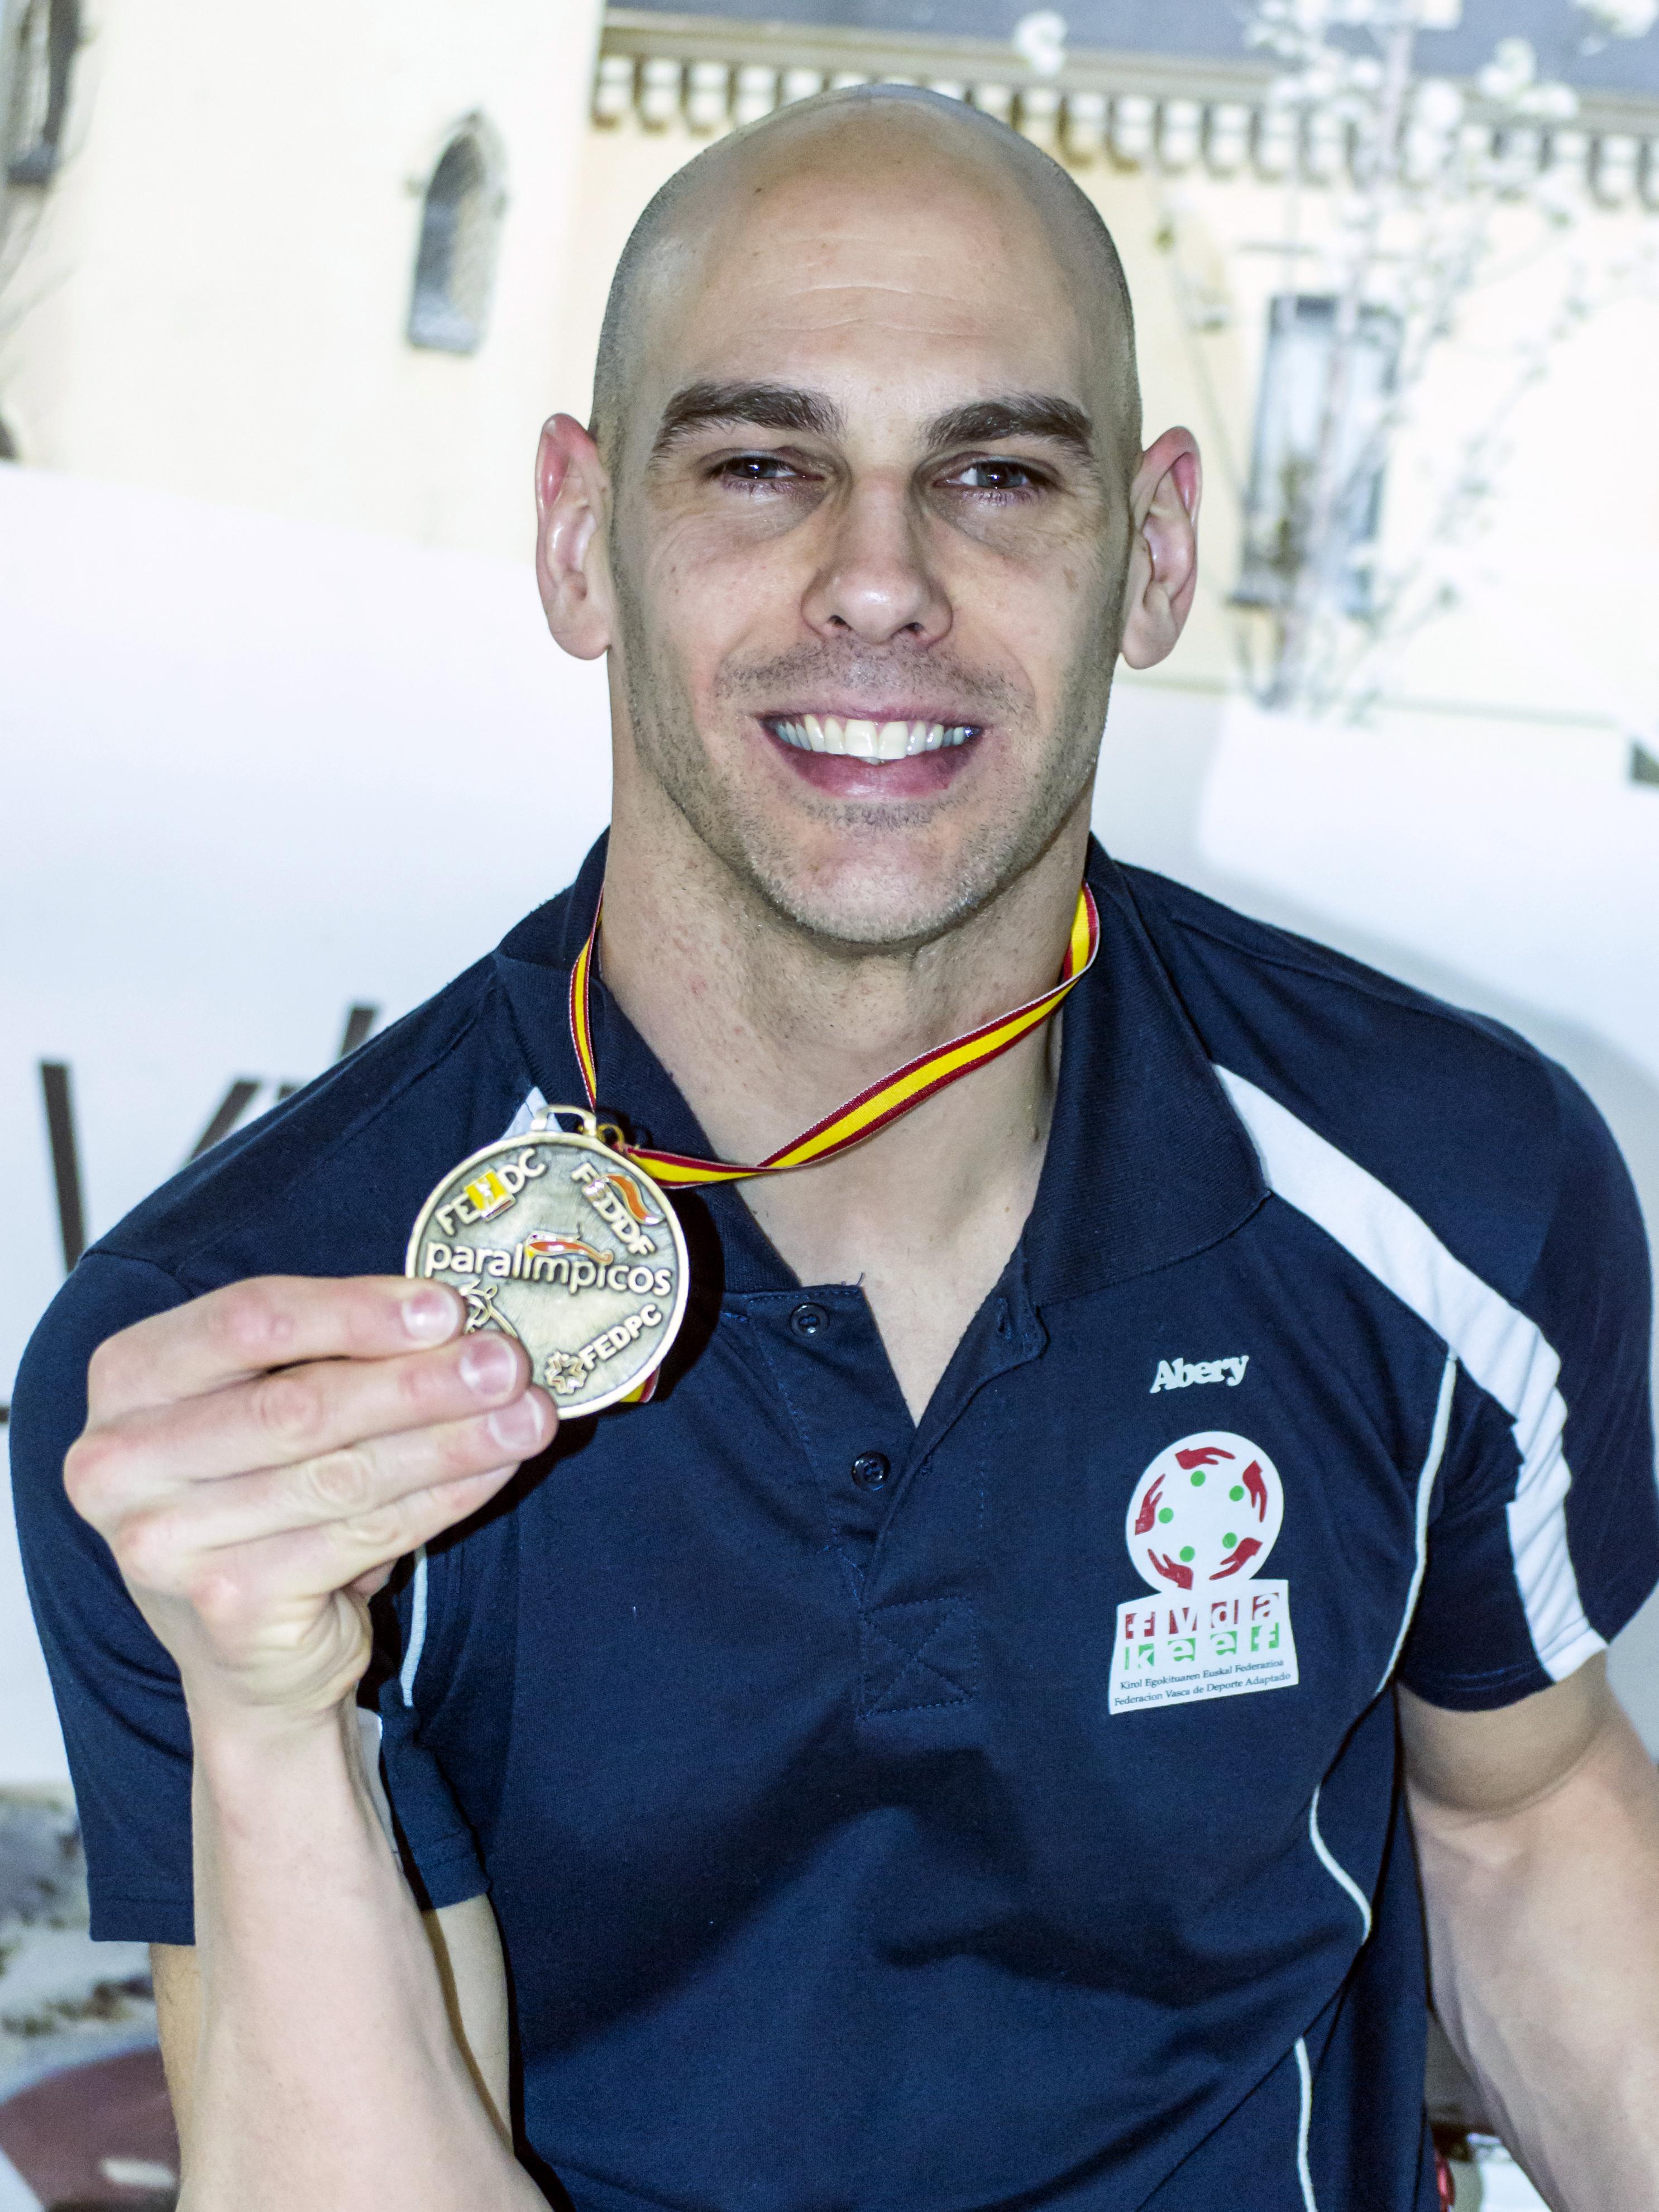 Richard medalla, foto Silvia Laya.jpg